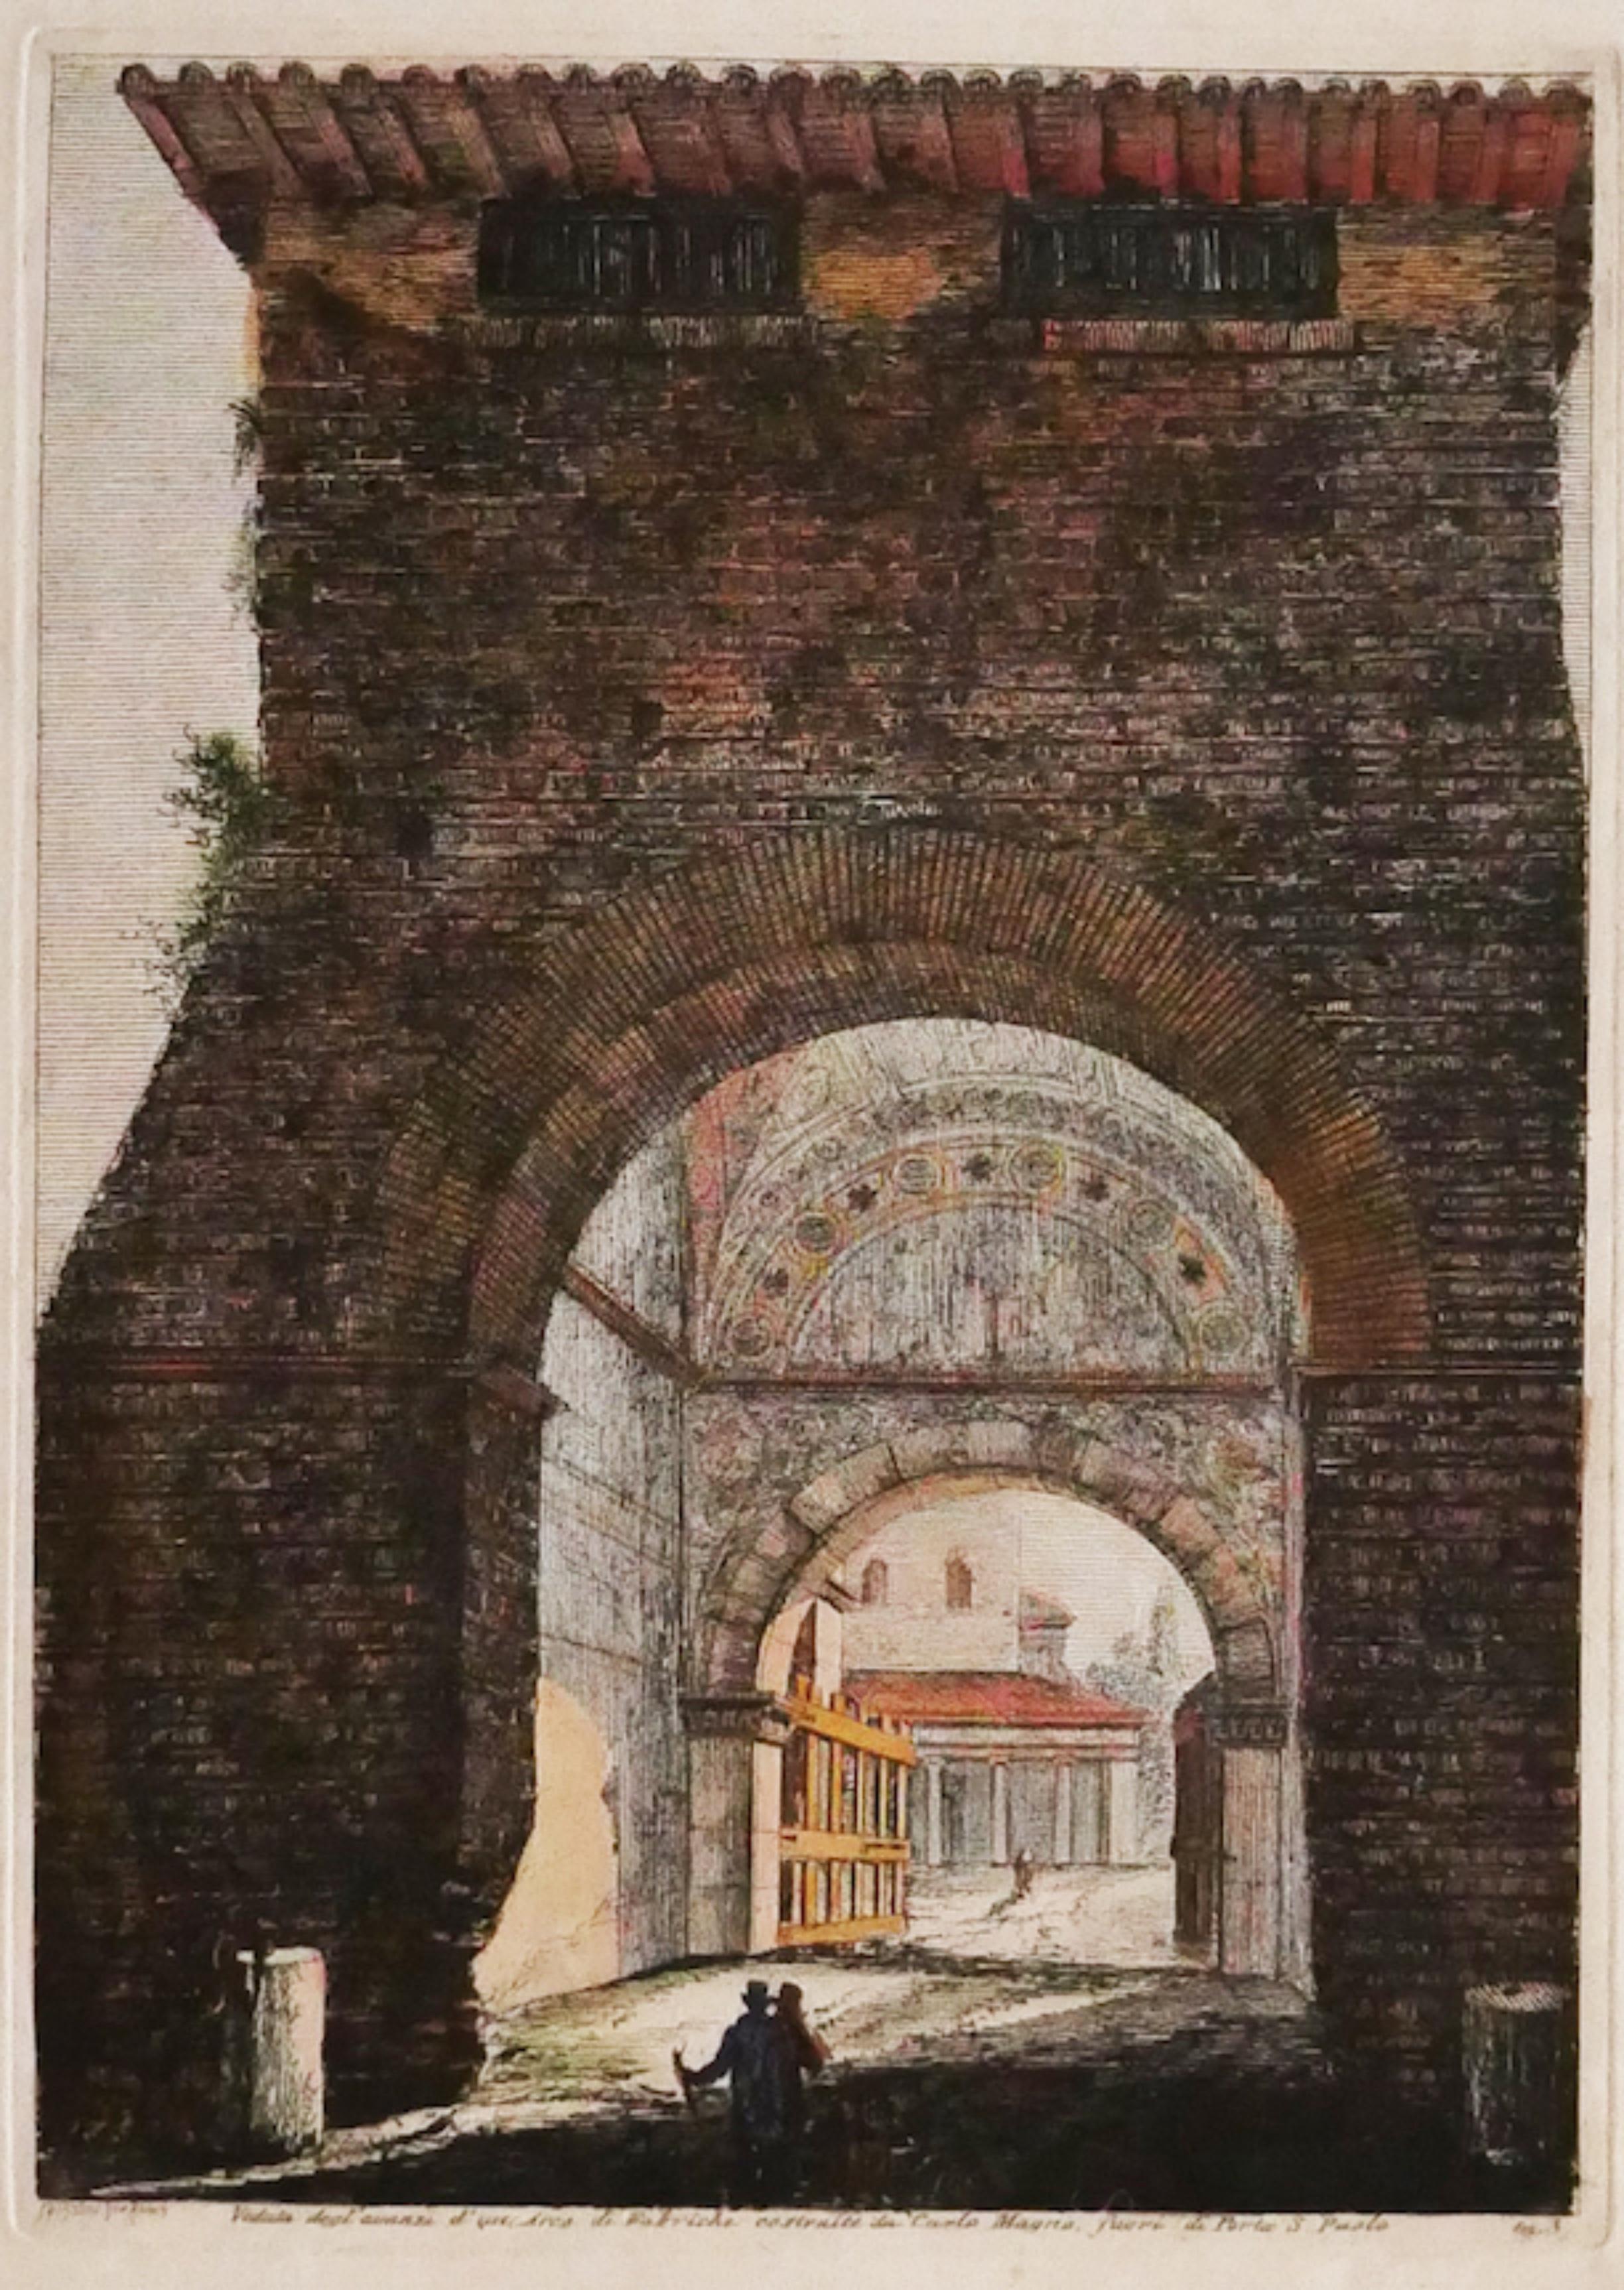 Arch - Original Etching by Luigi Rossini - 19th Century